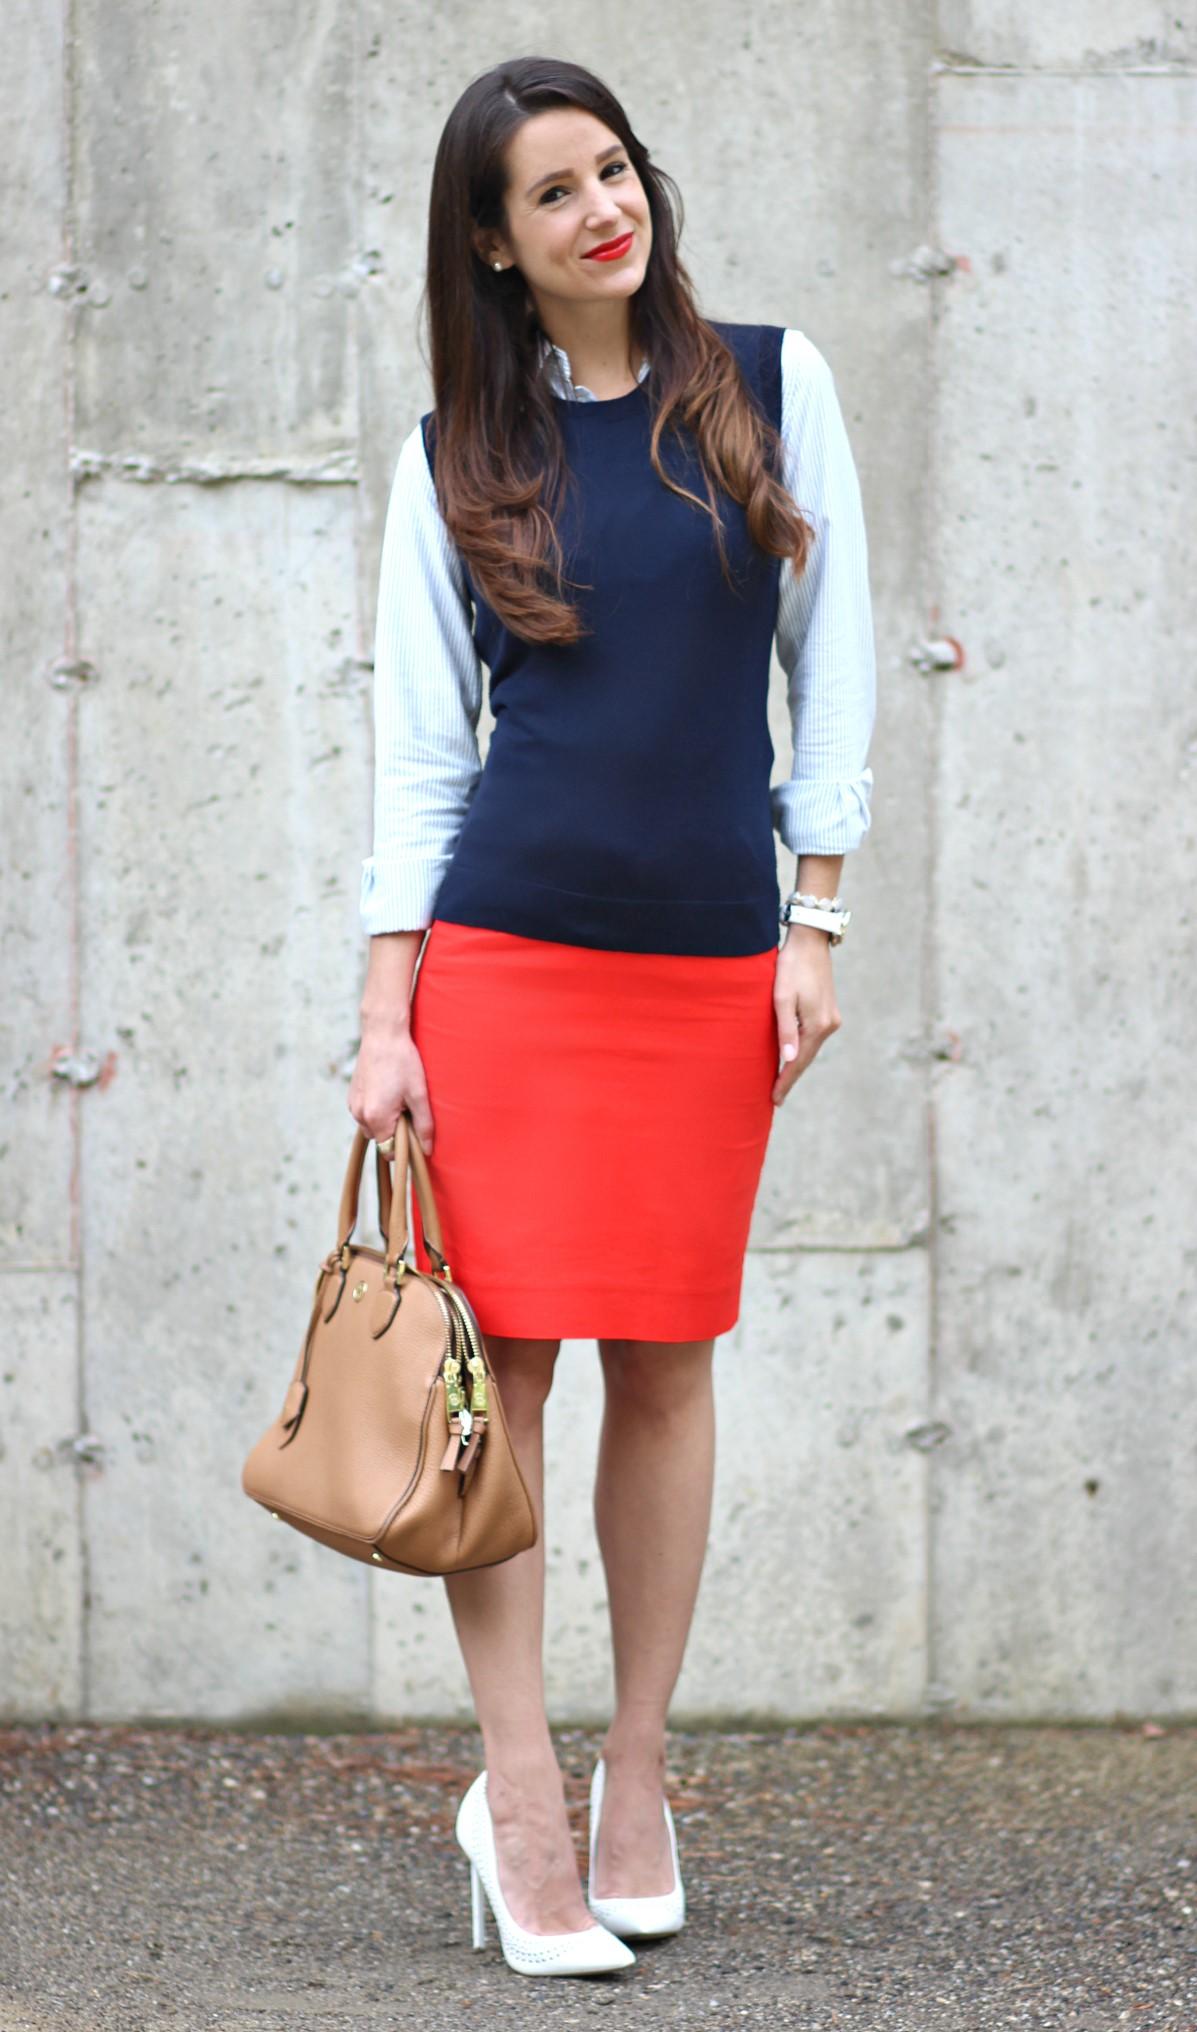 orange-pencil-skirt-blue-navy-sweatersl-vest-white-shoe-pumps-tan-bag-hairr-spring-summer-work.jpg